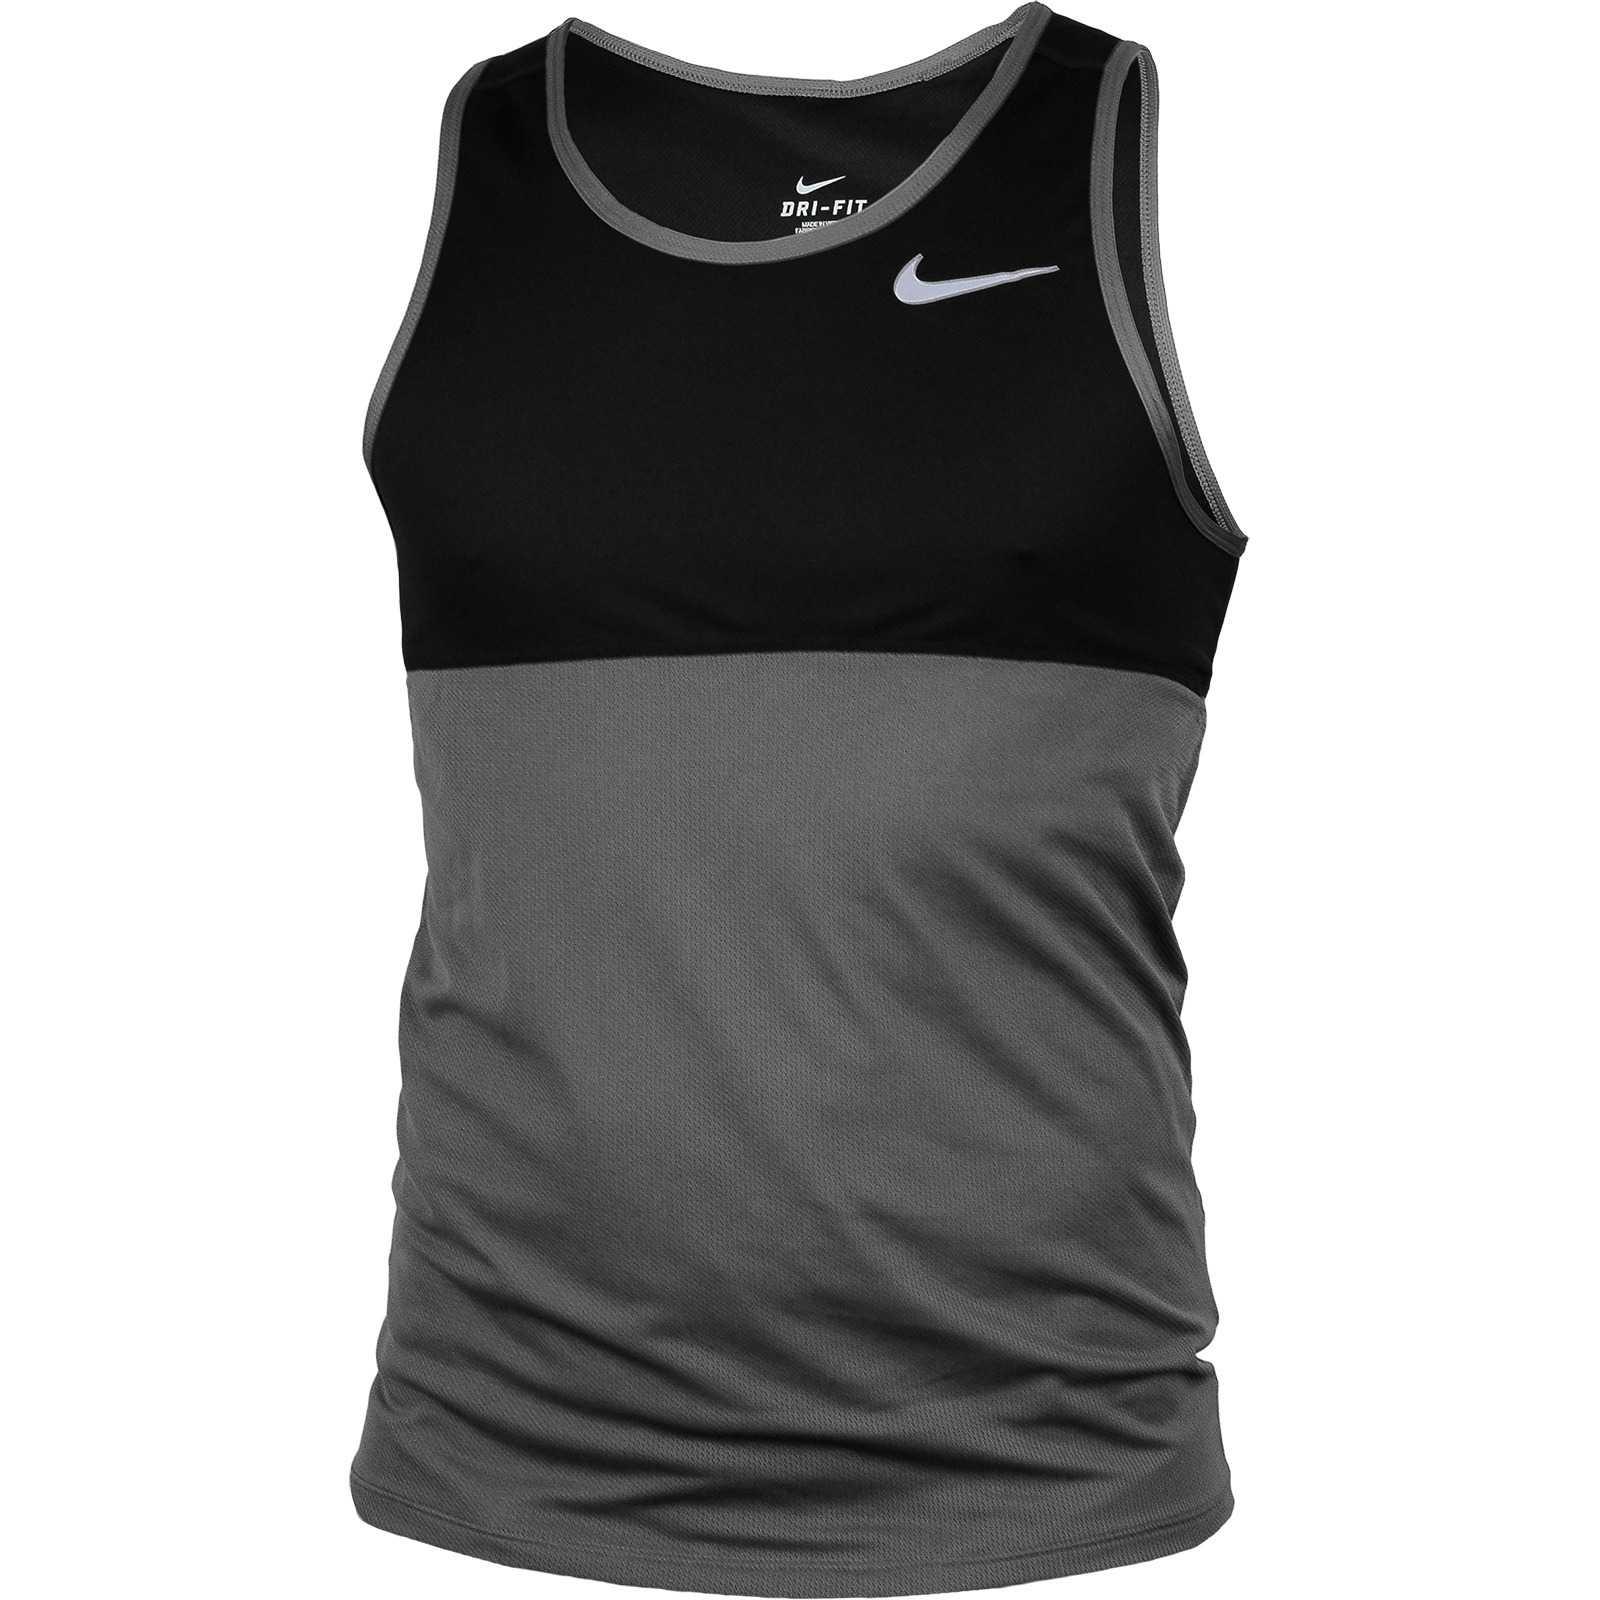 Maieu barbati Nike Racer Singlet 642844-021